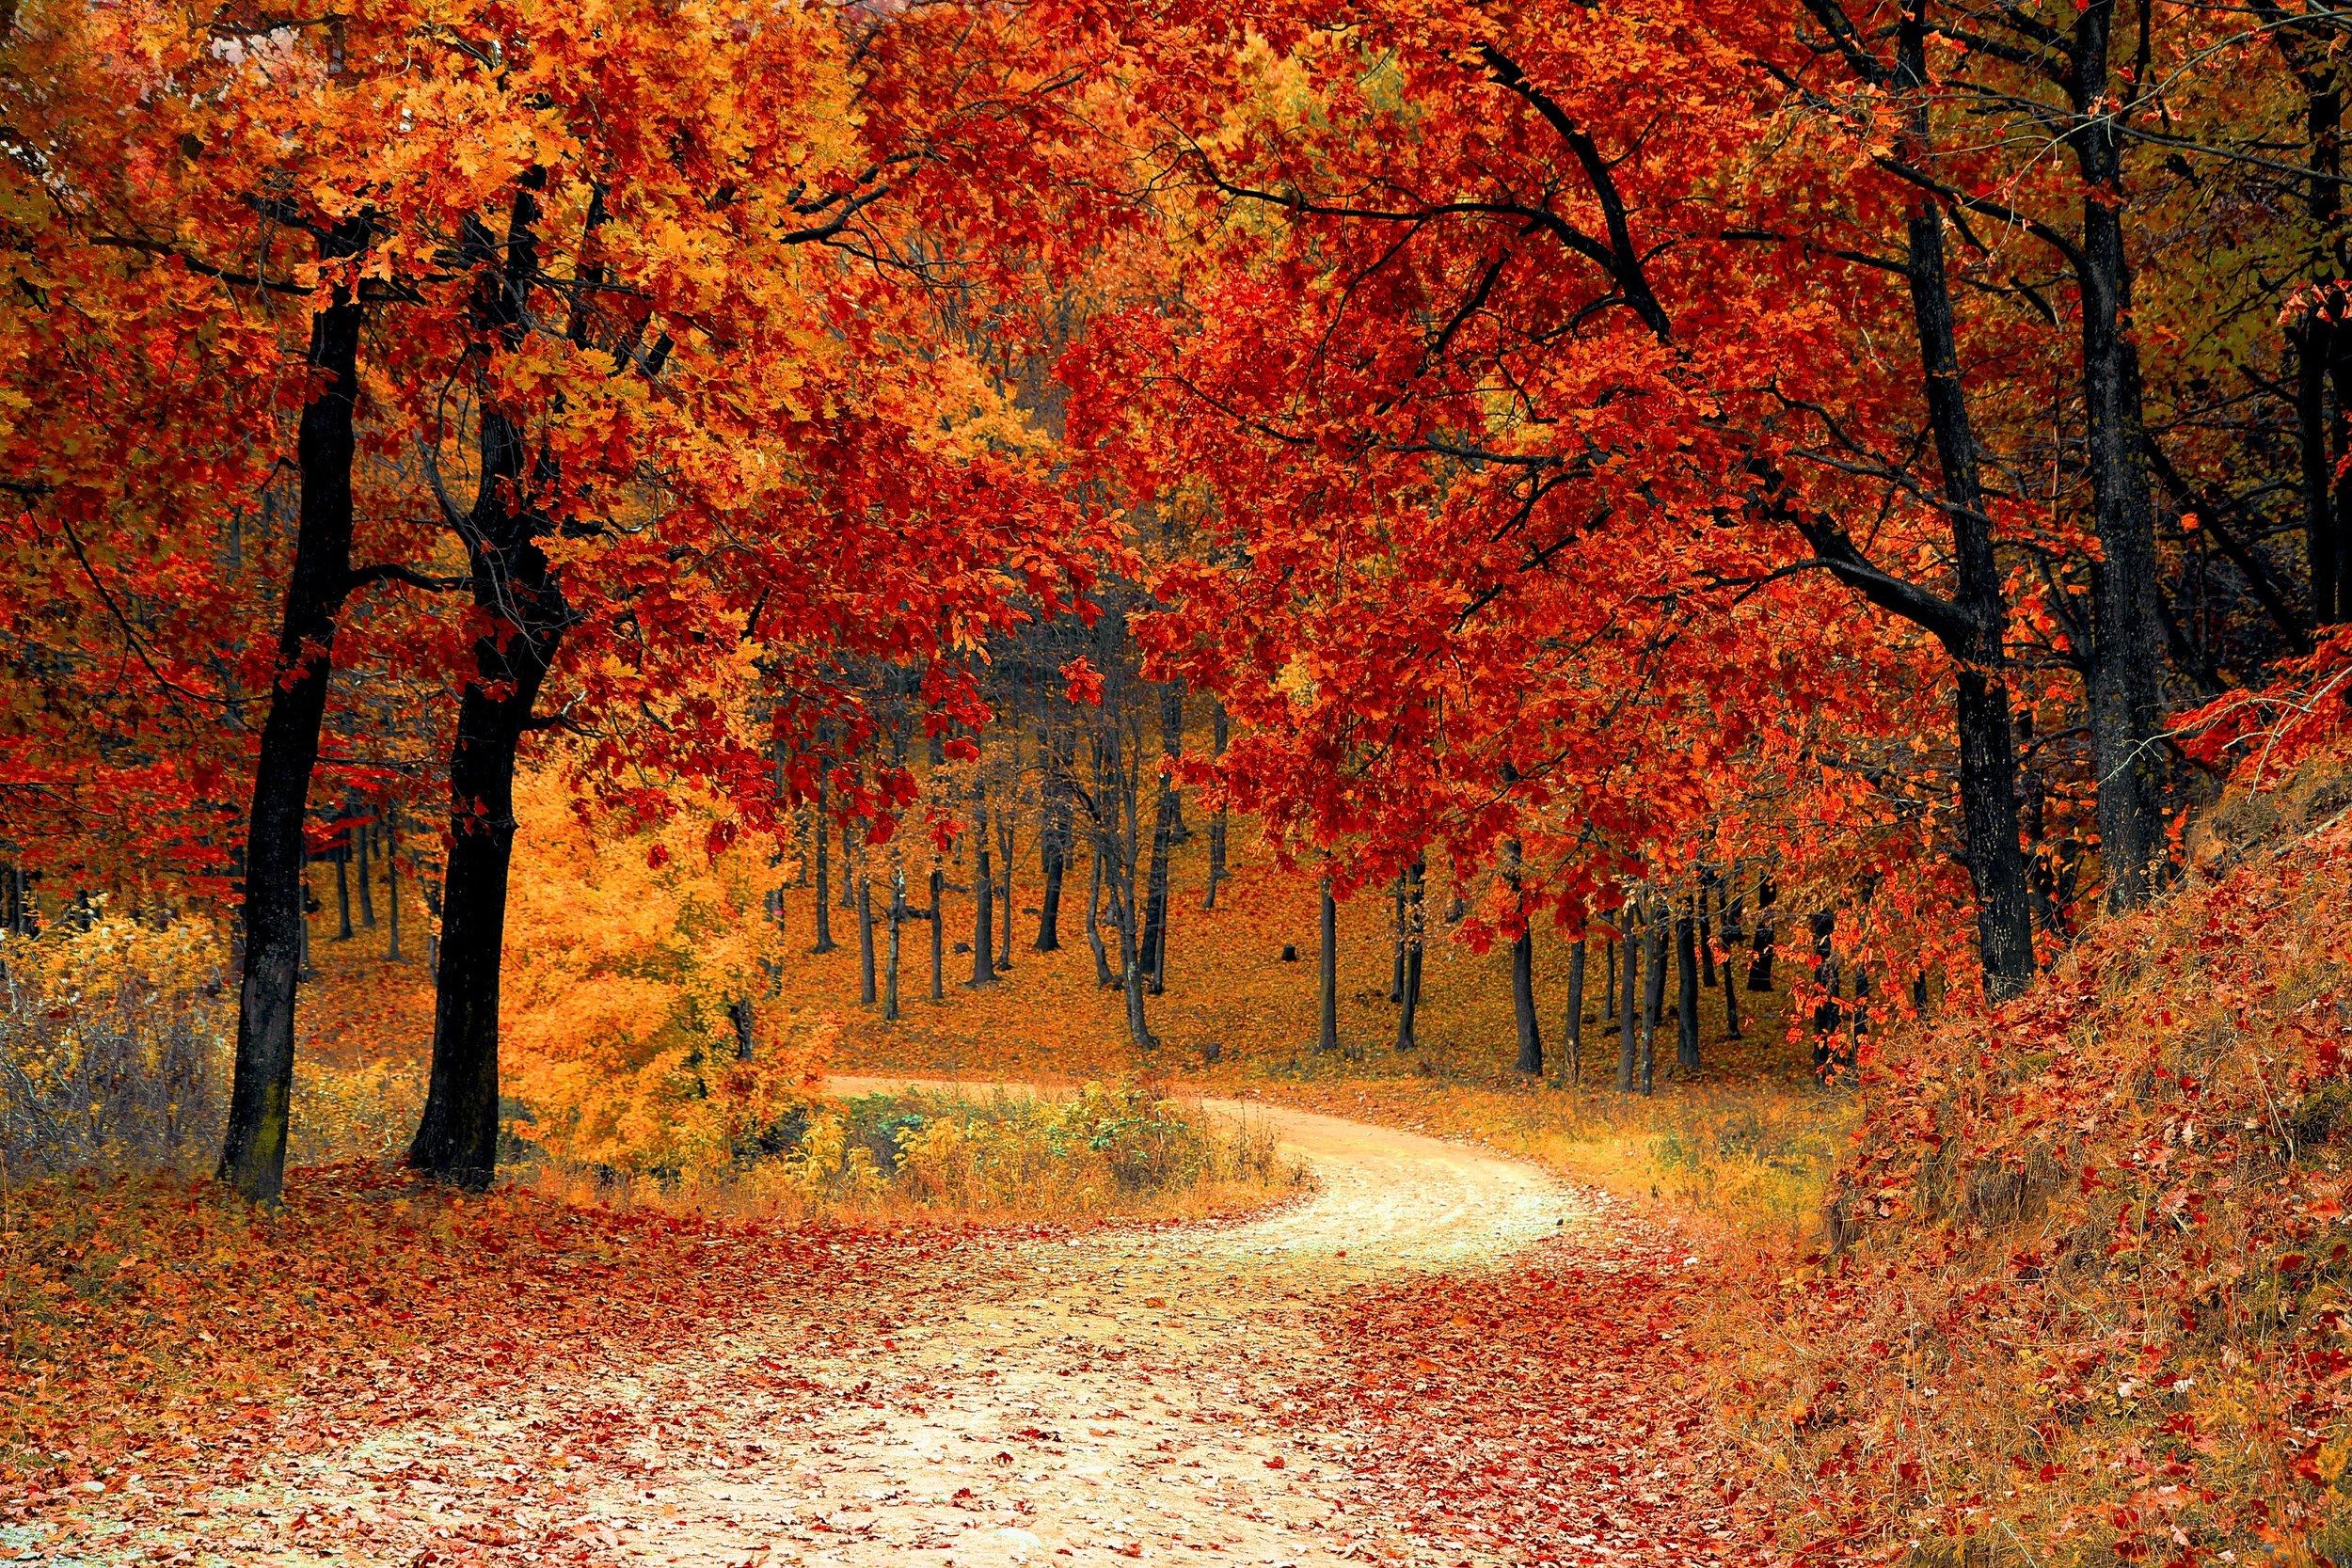 autumn-colorful-colourful-33109.jpg